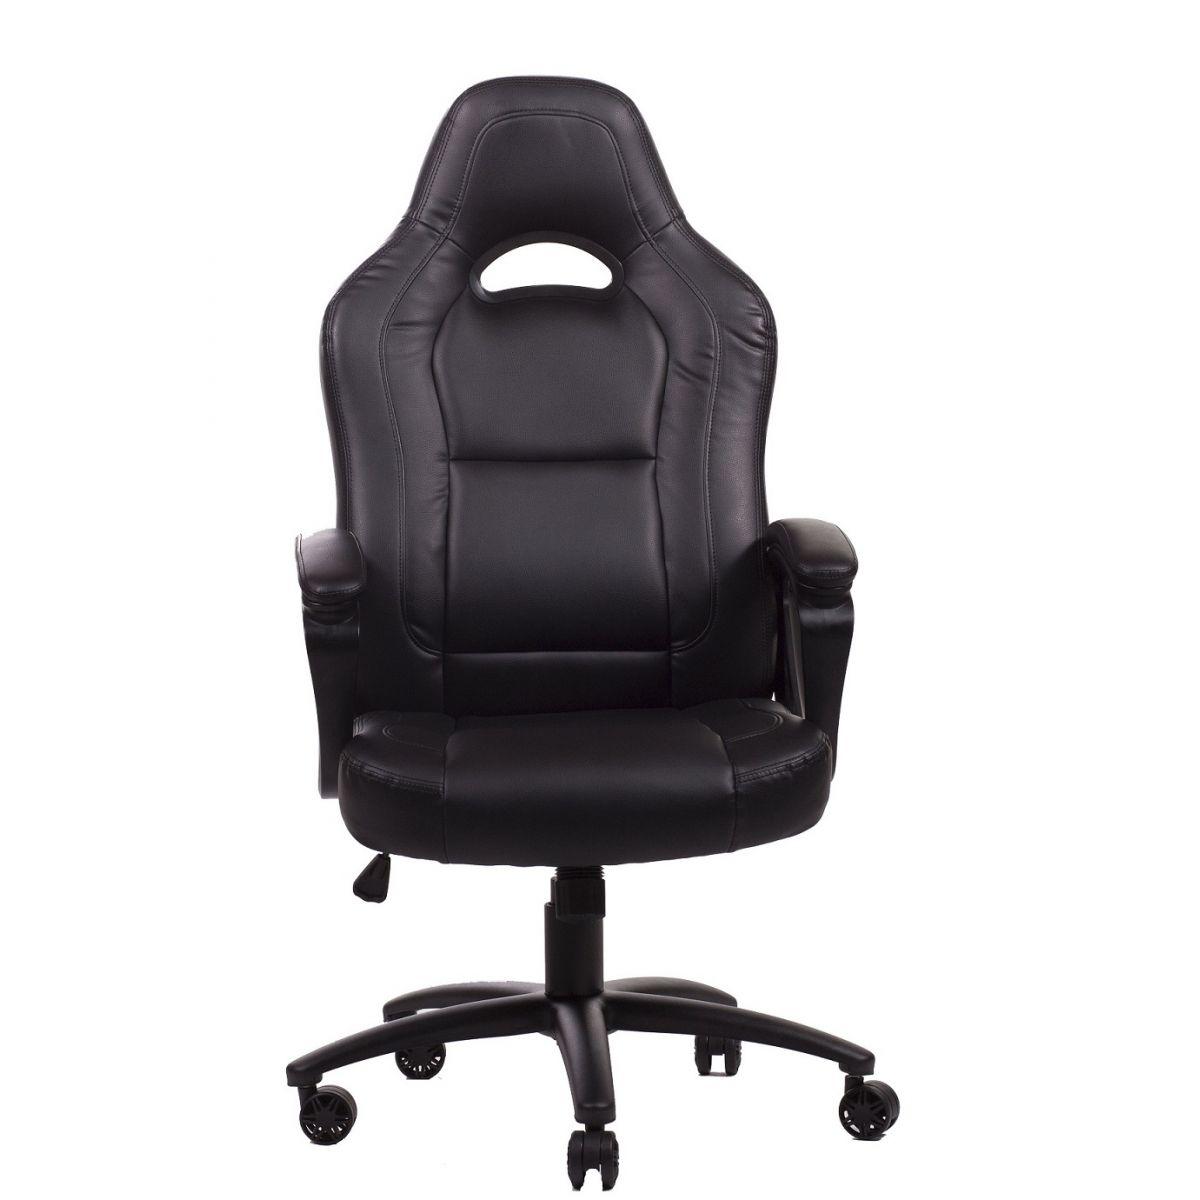 Cadeira Gaming GTO Black (10181-1) - DT3 Sports